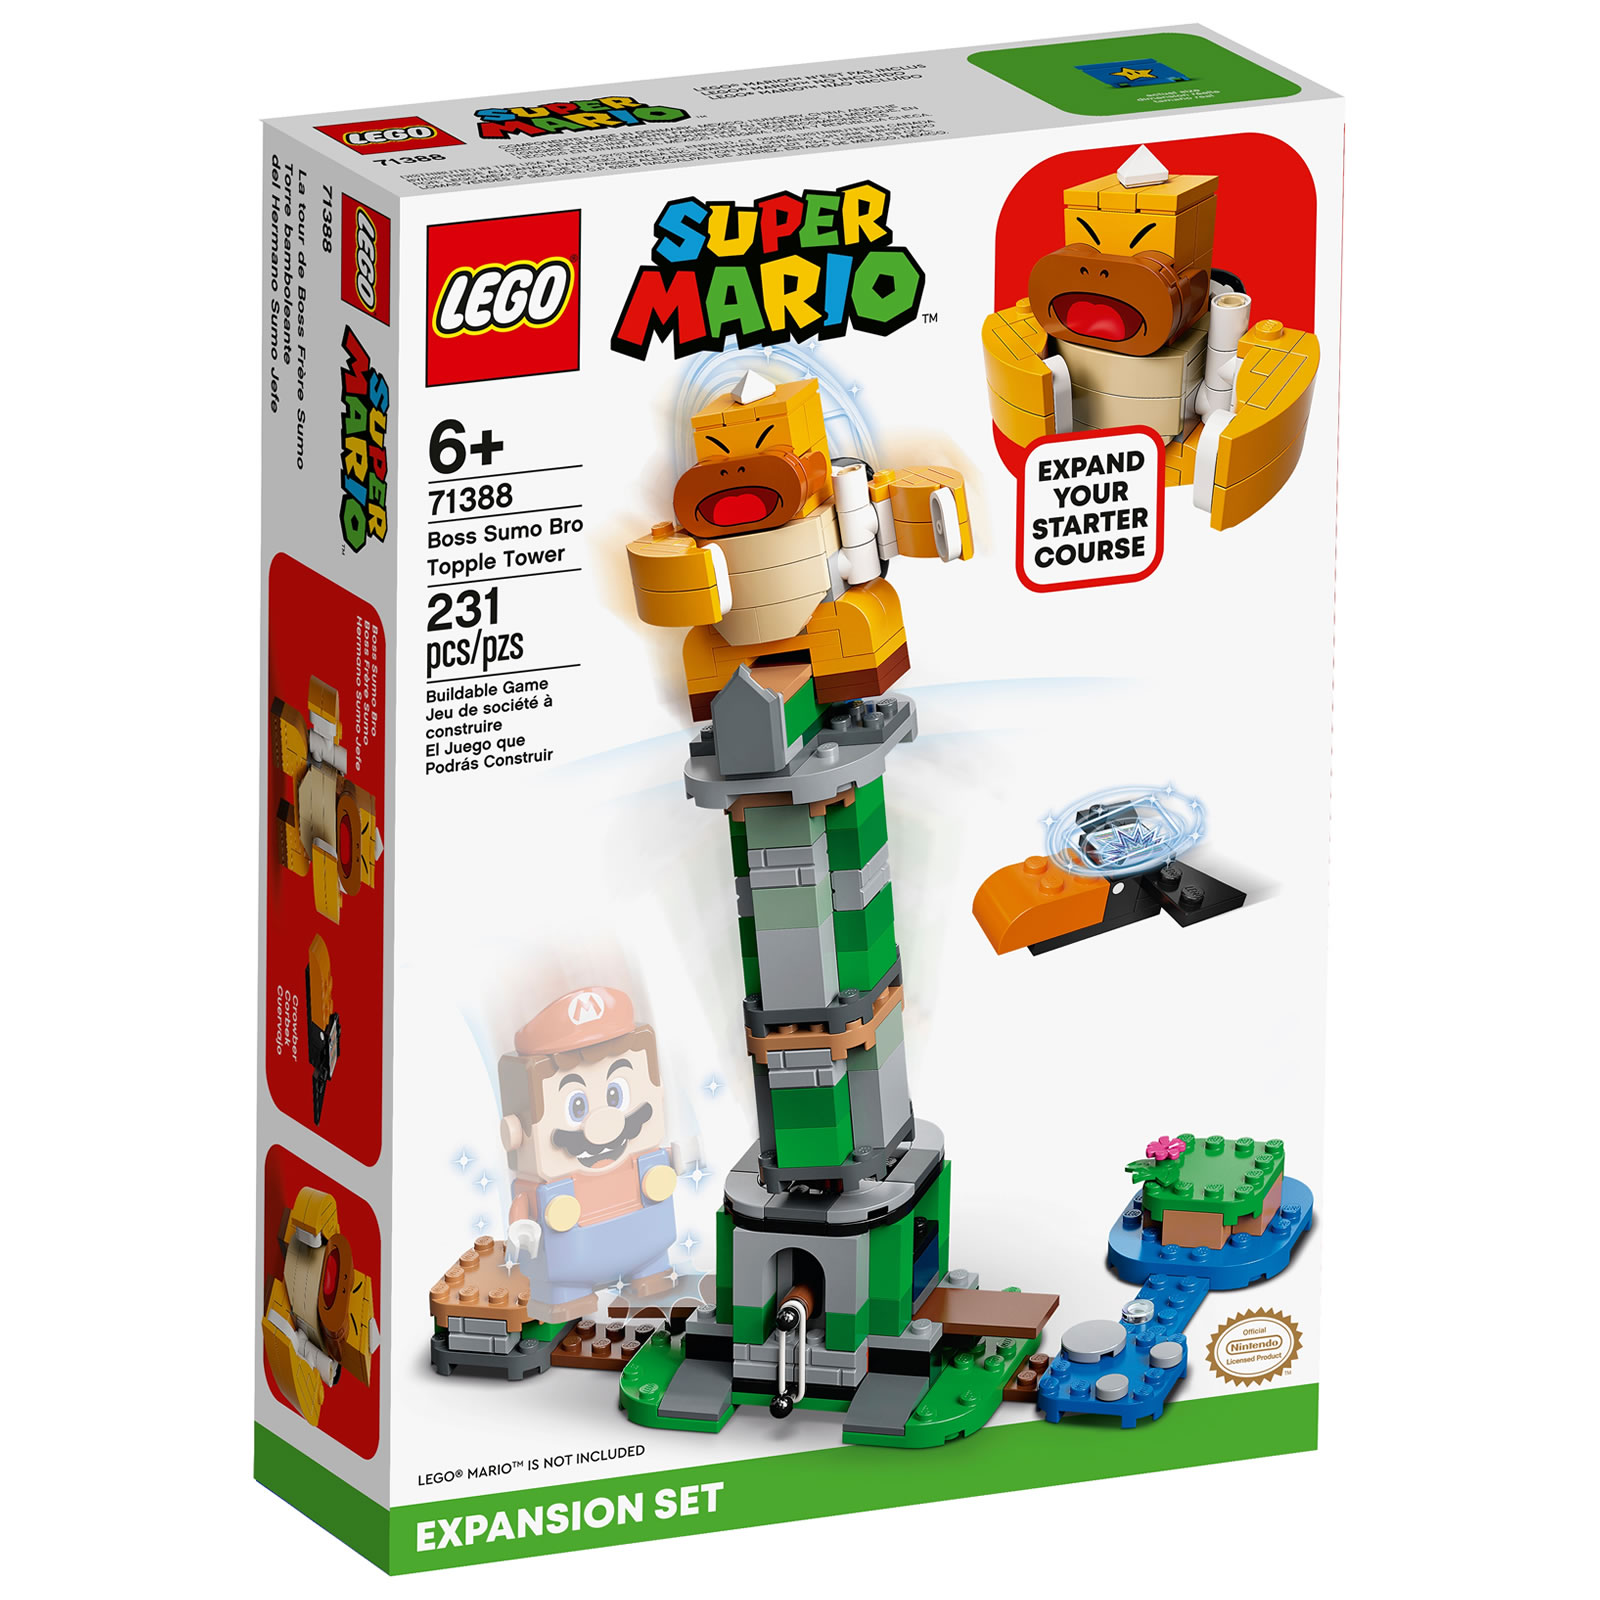 Nintendo s'associe avec LEGO ! - Page 5 71388-lego-super-mario-boss-sumo-bro-topple-tower-1